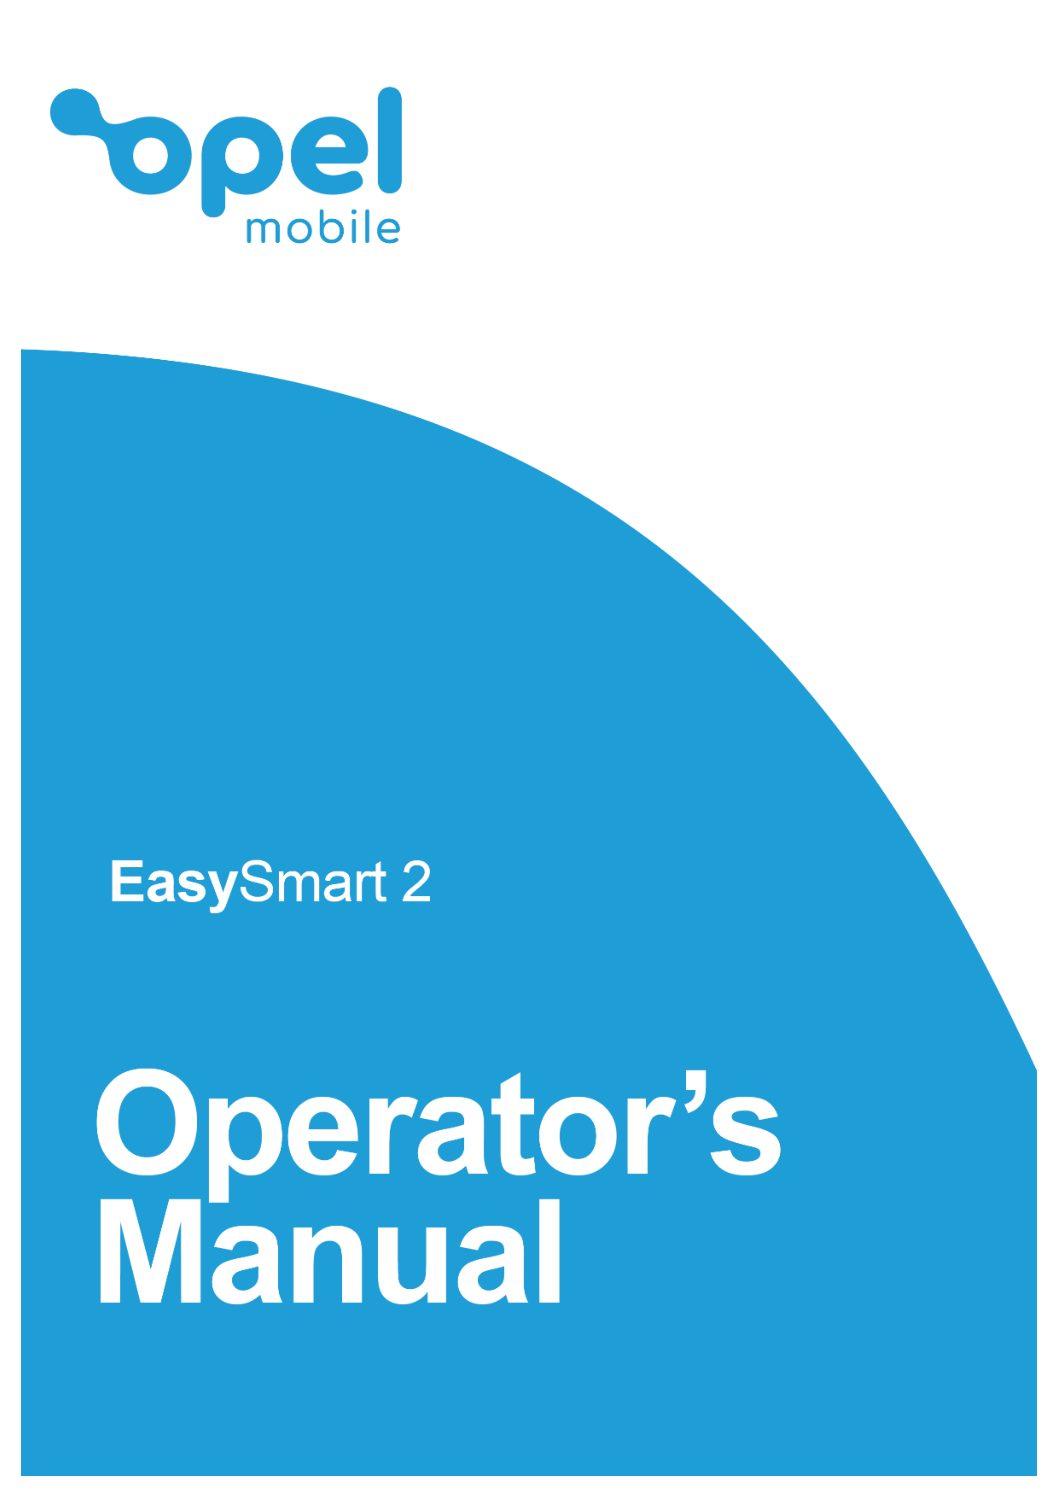 EasySmart 2 Operator's Manual